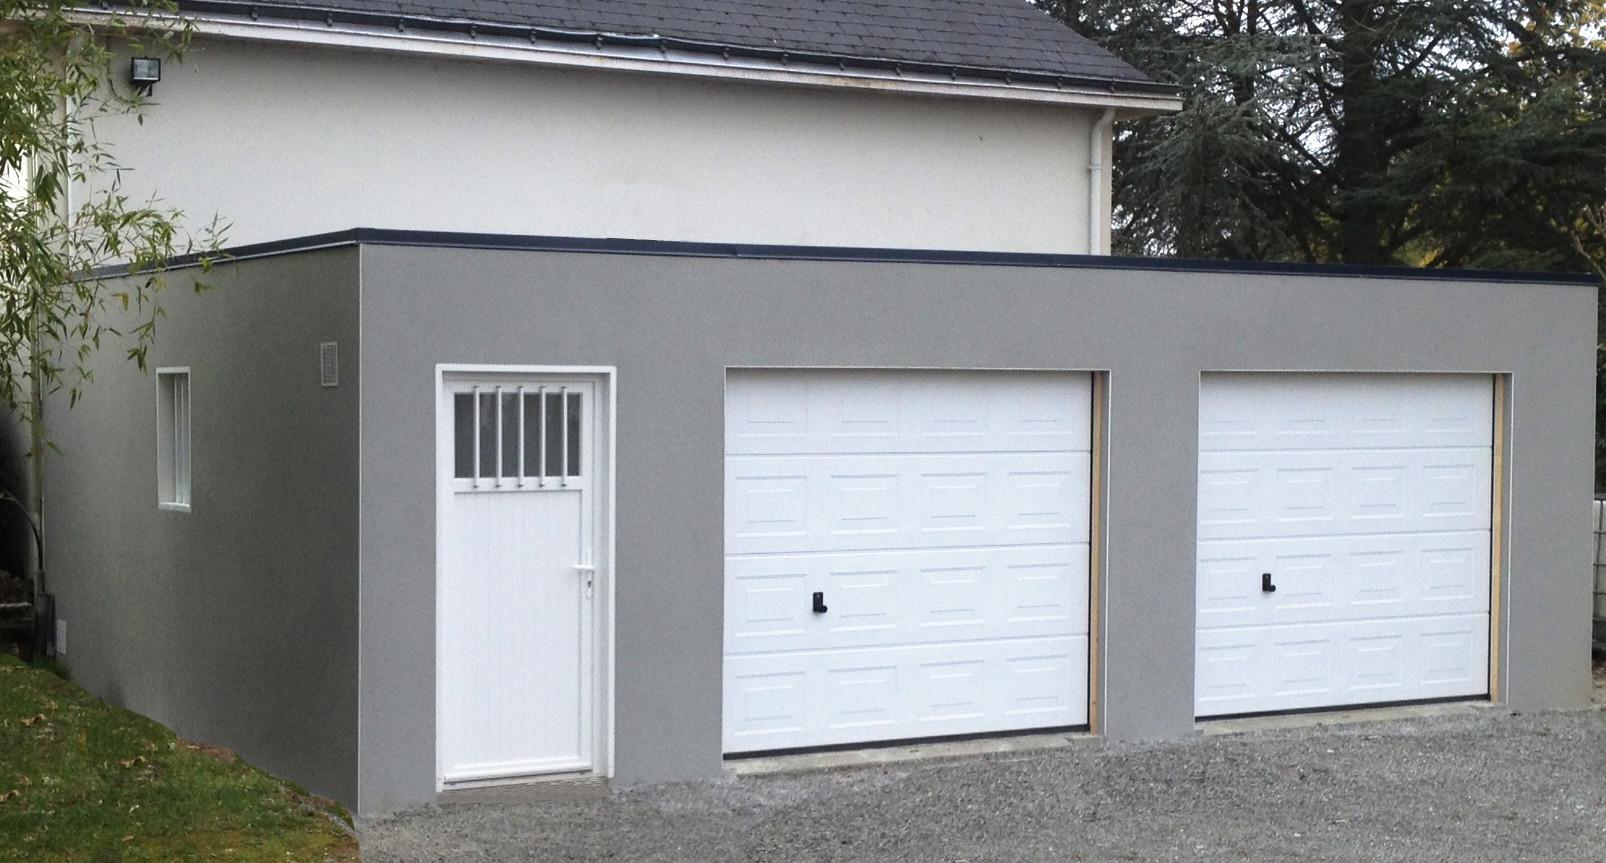 Garage Toit Plat Beton dans Construction Garage Bois